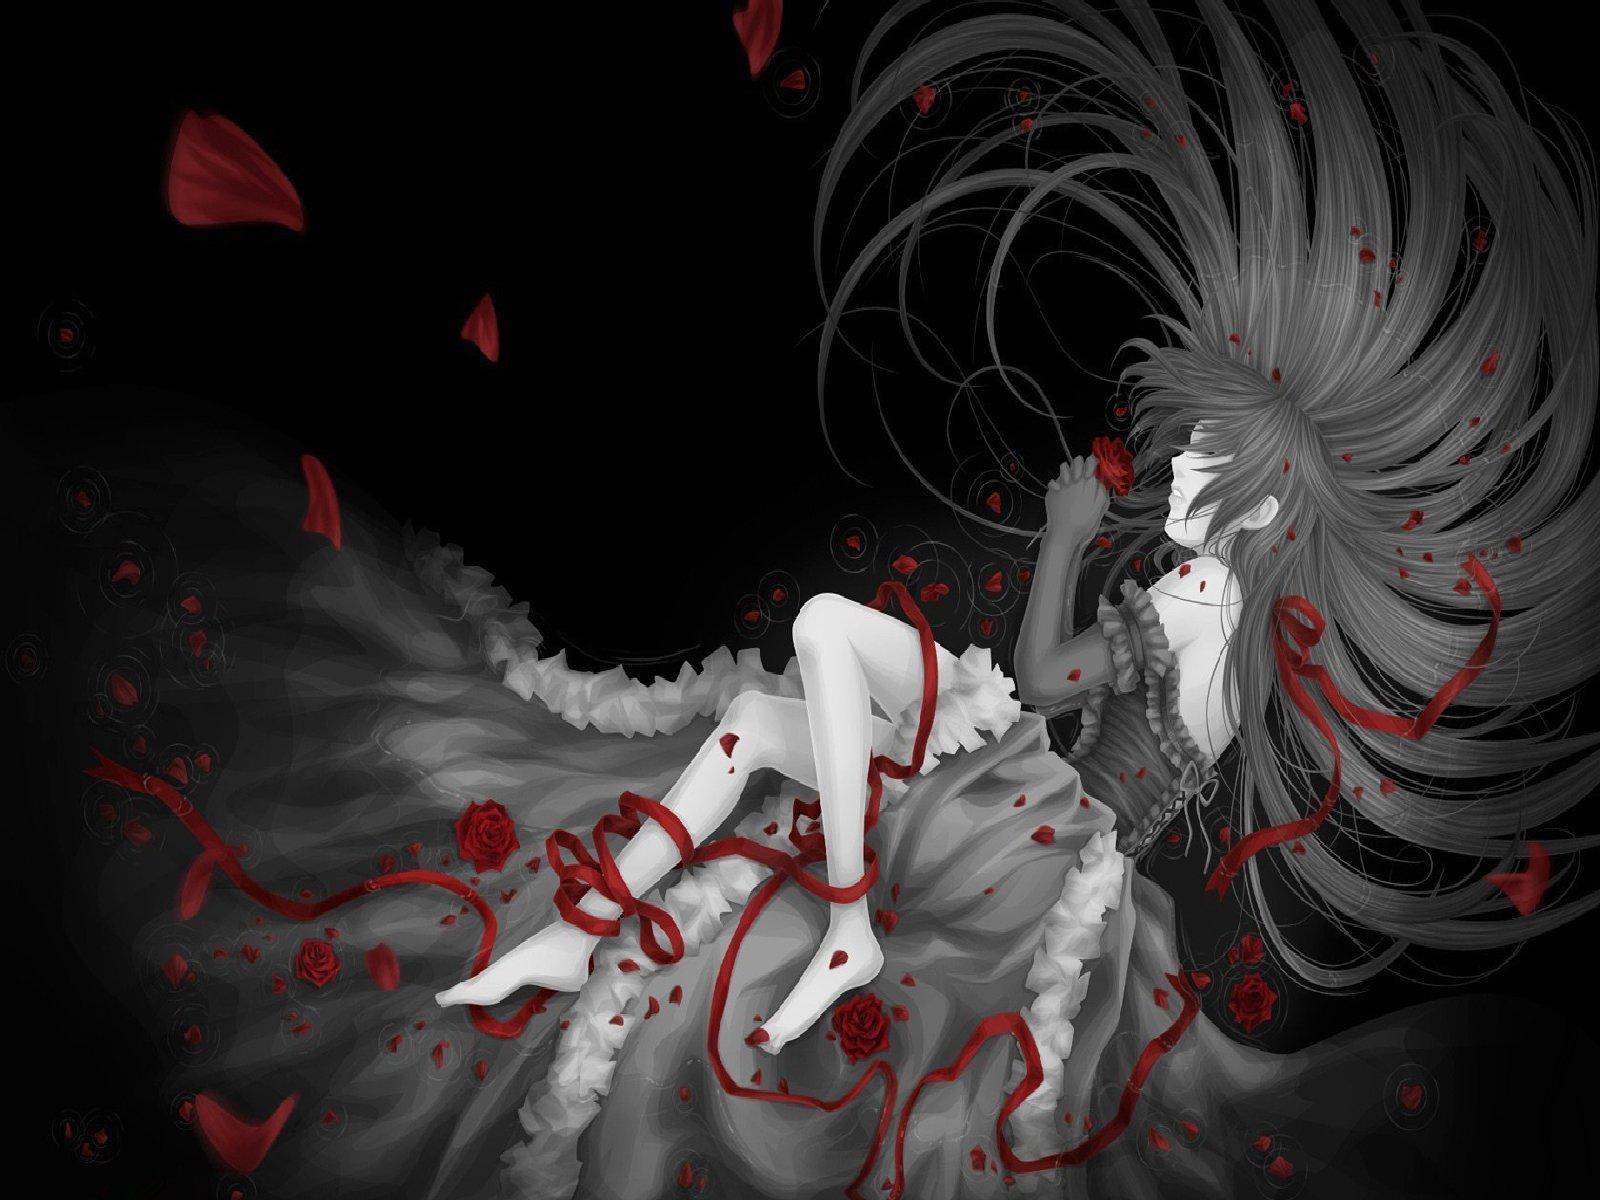 [47+] Cool Dark Anime Wallpapers on WallpaperSafari